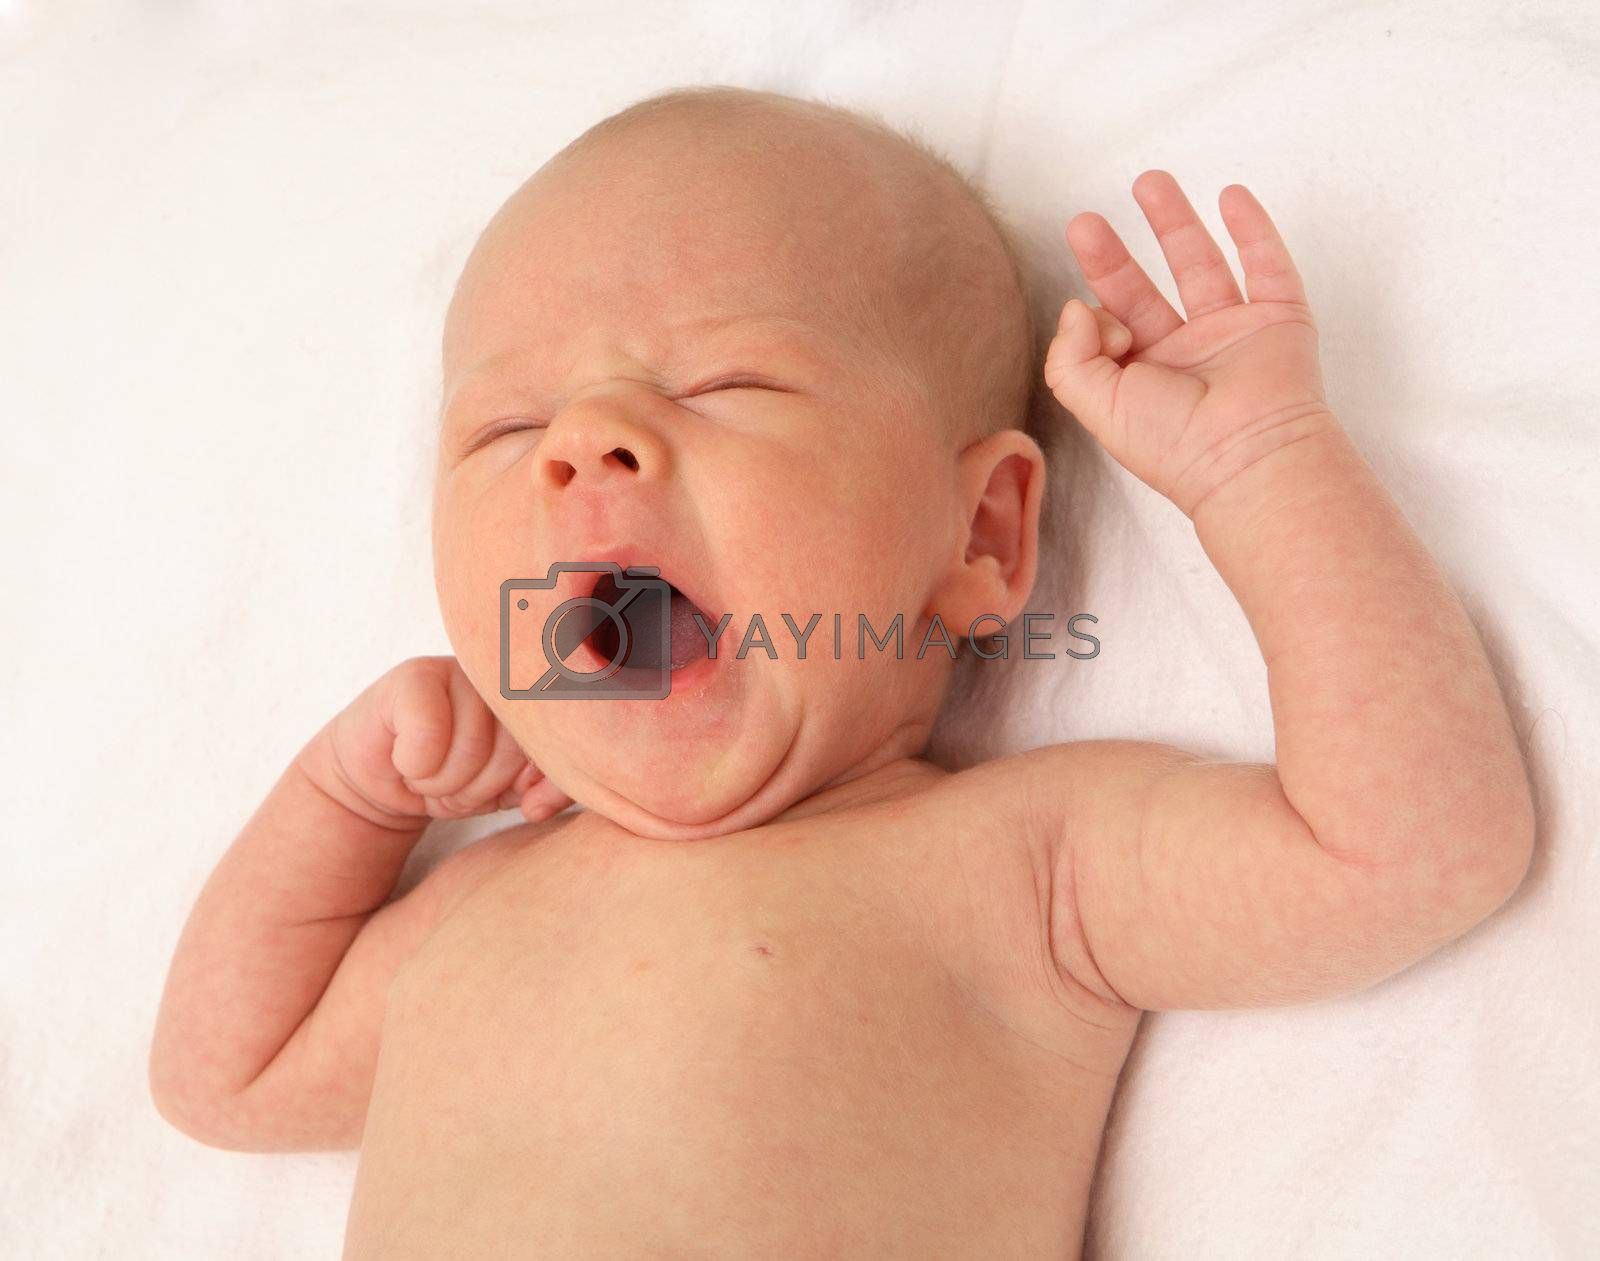 The baby yawns